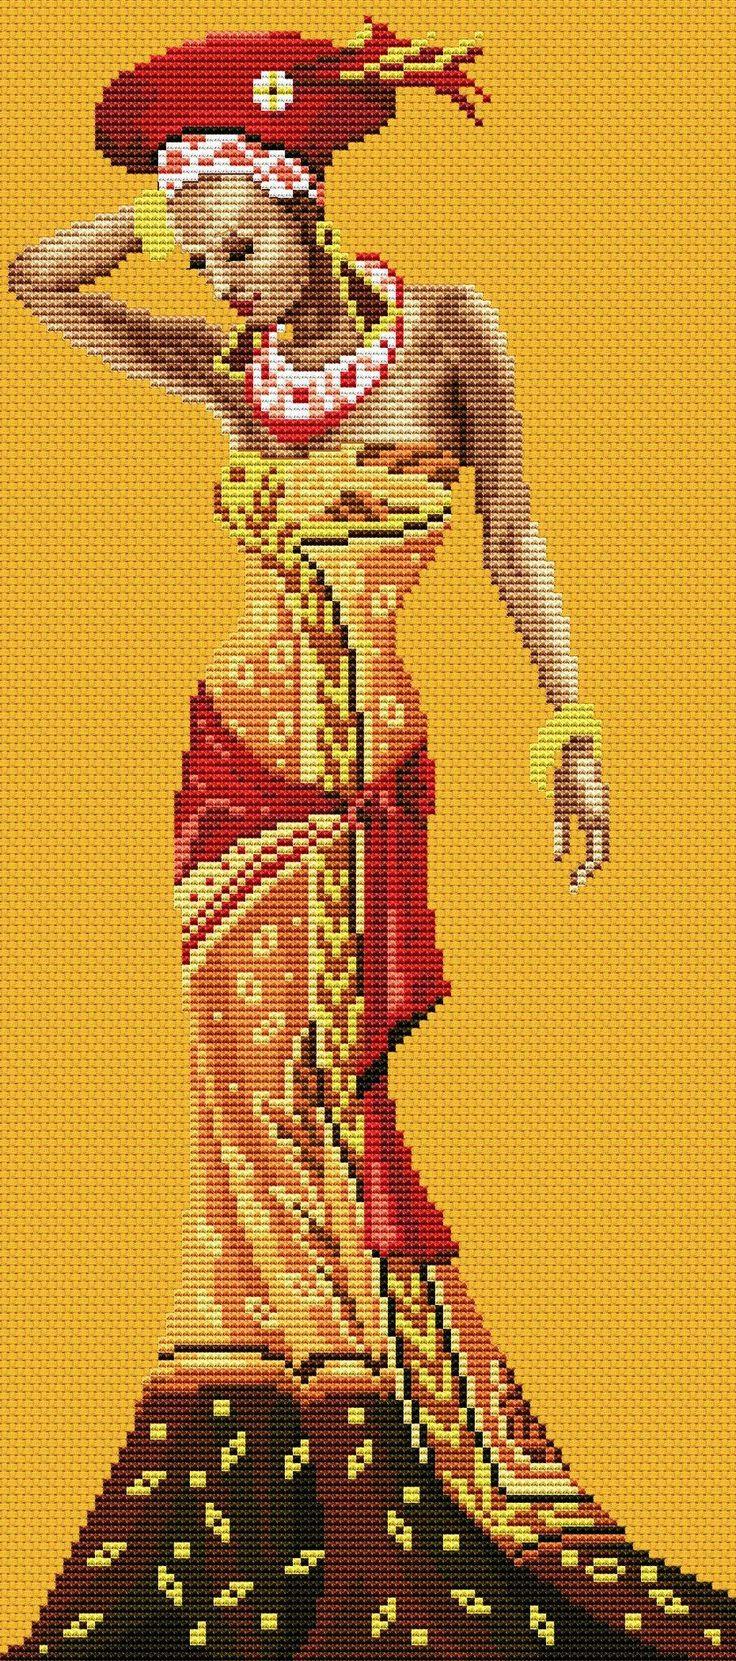 XW7arLG-WQ8.jpg 907×2,048 pixeles